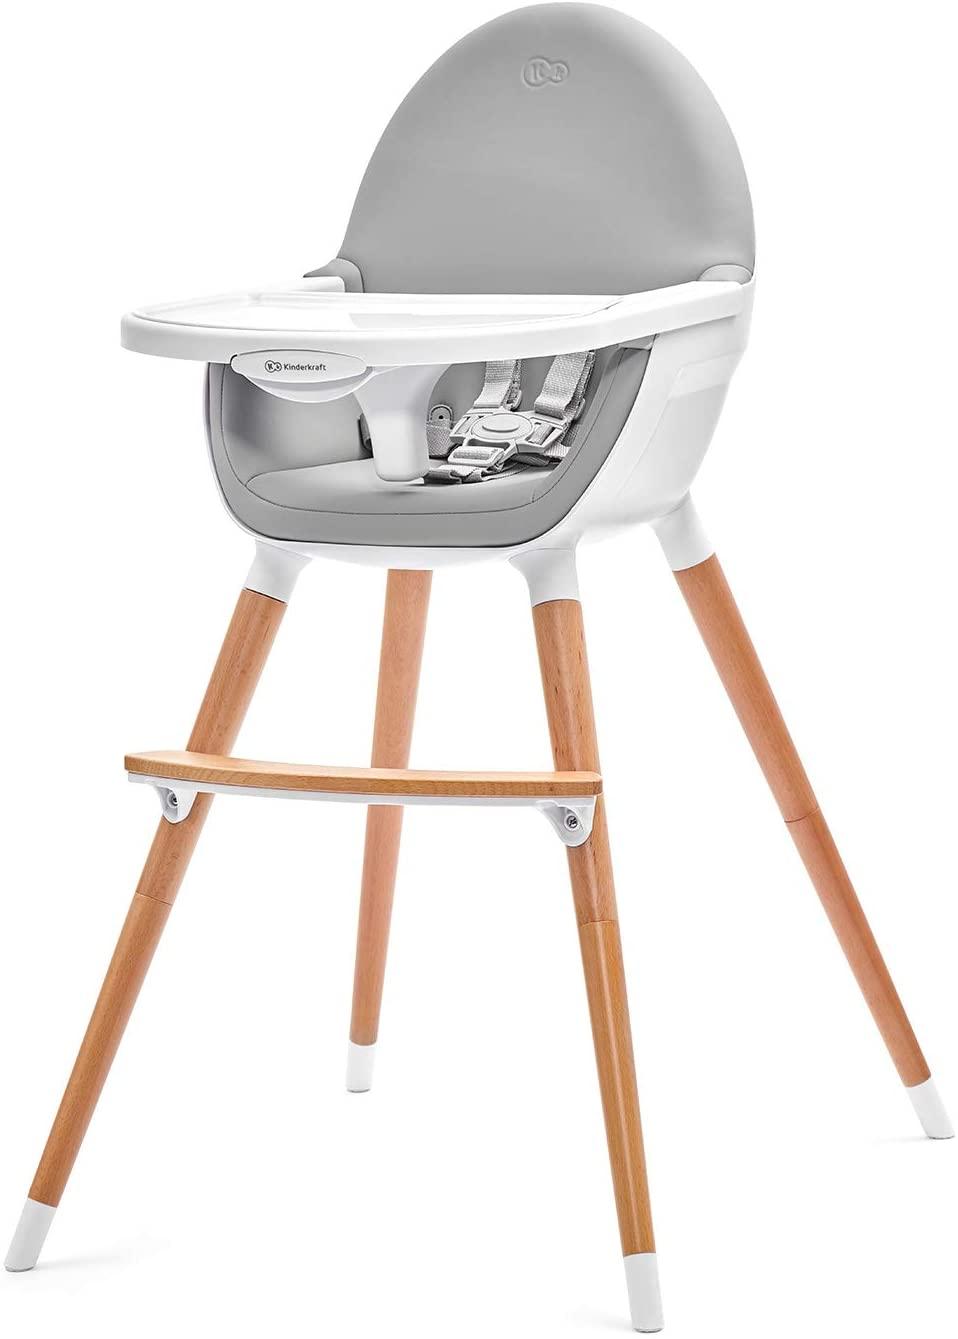 Chaise haute bébé de KinderKraft